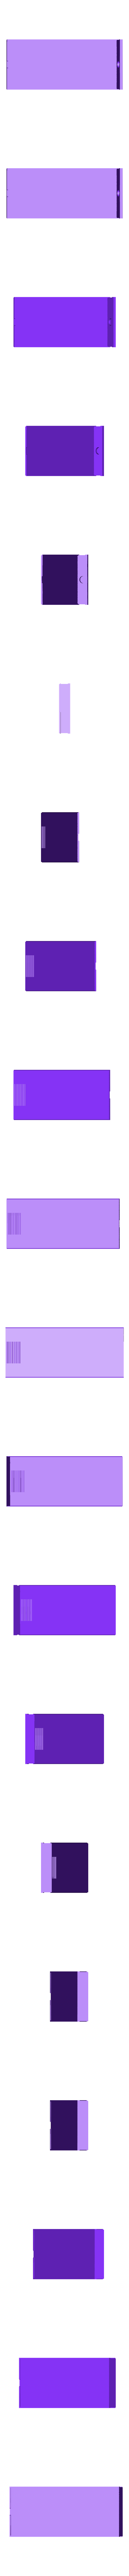 cashStash_lid_v01.STL Download free STL file Magnetic WiFi Repeater Stash Box for Cash & Valuables • 3D printing model, sneaks